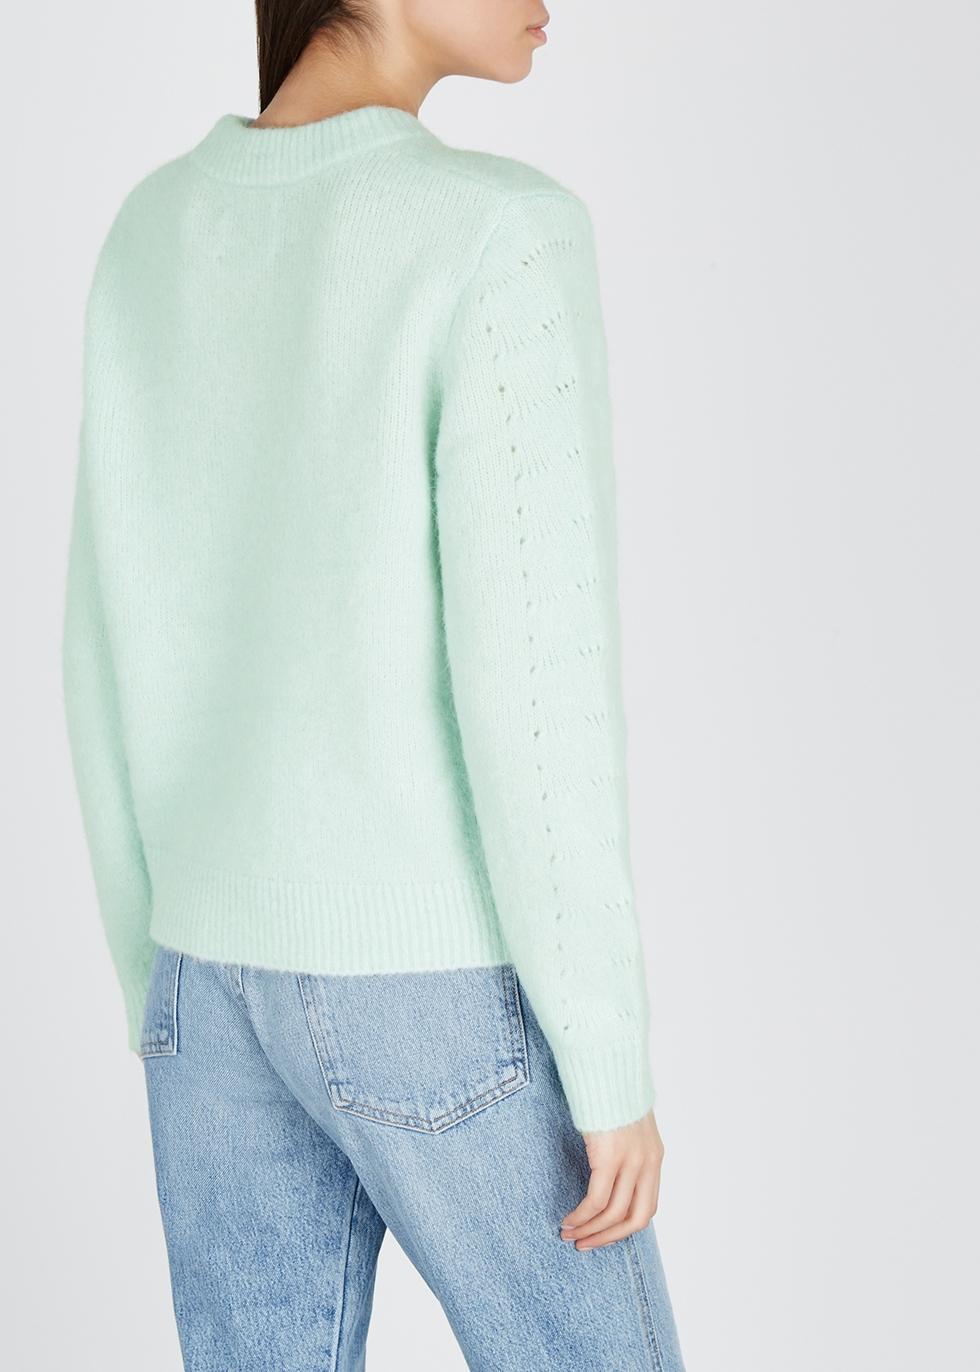 Nola mint pointelle-knit jumper - Samsøe & Samsøe